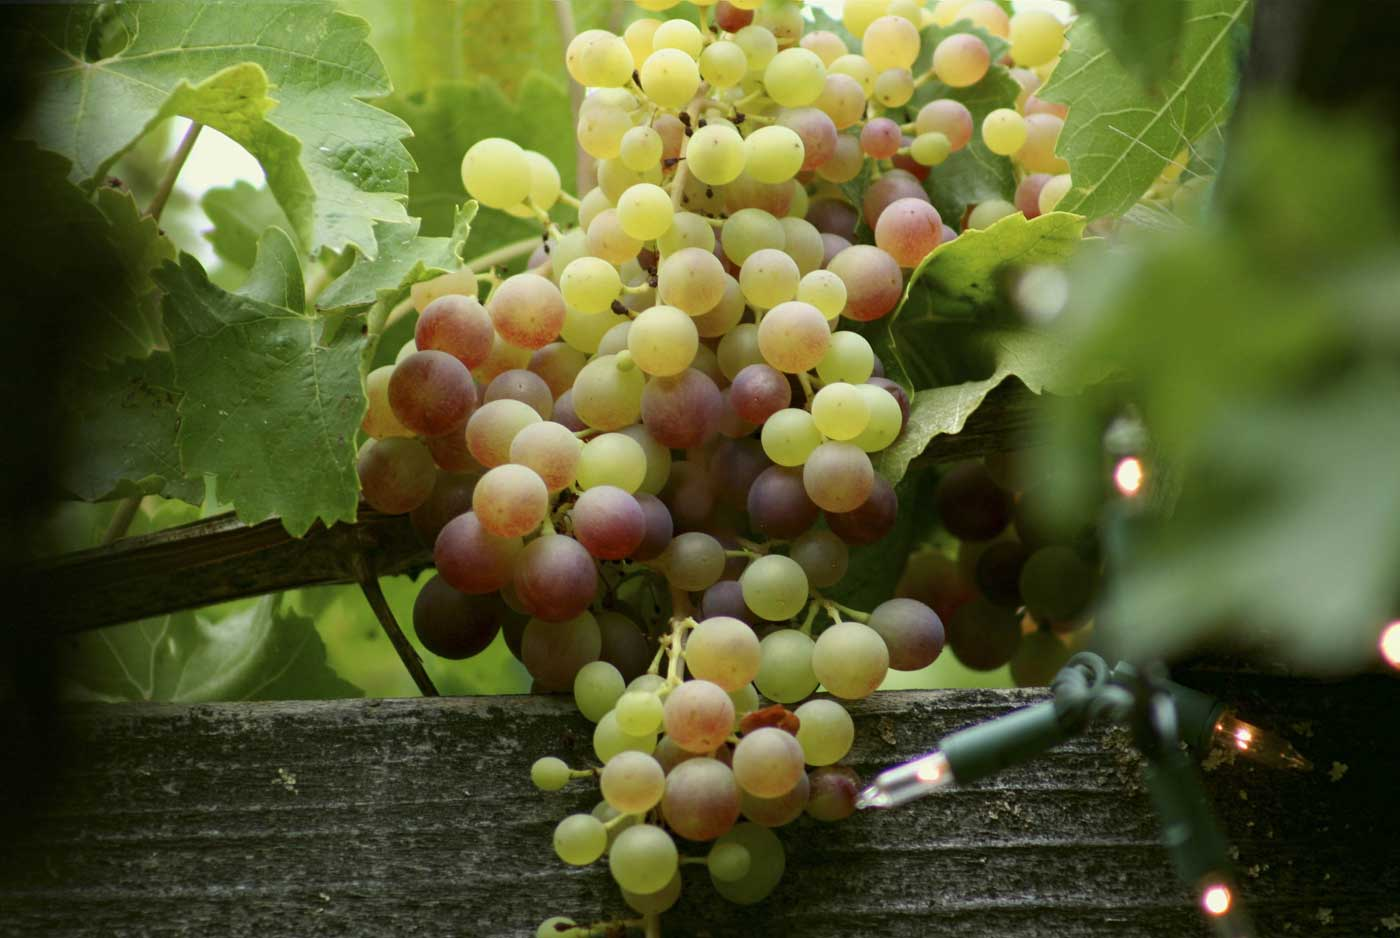 Vineyard heisst Weinberg